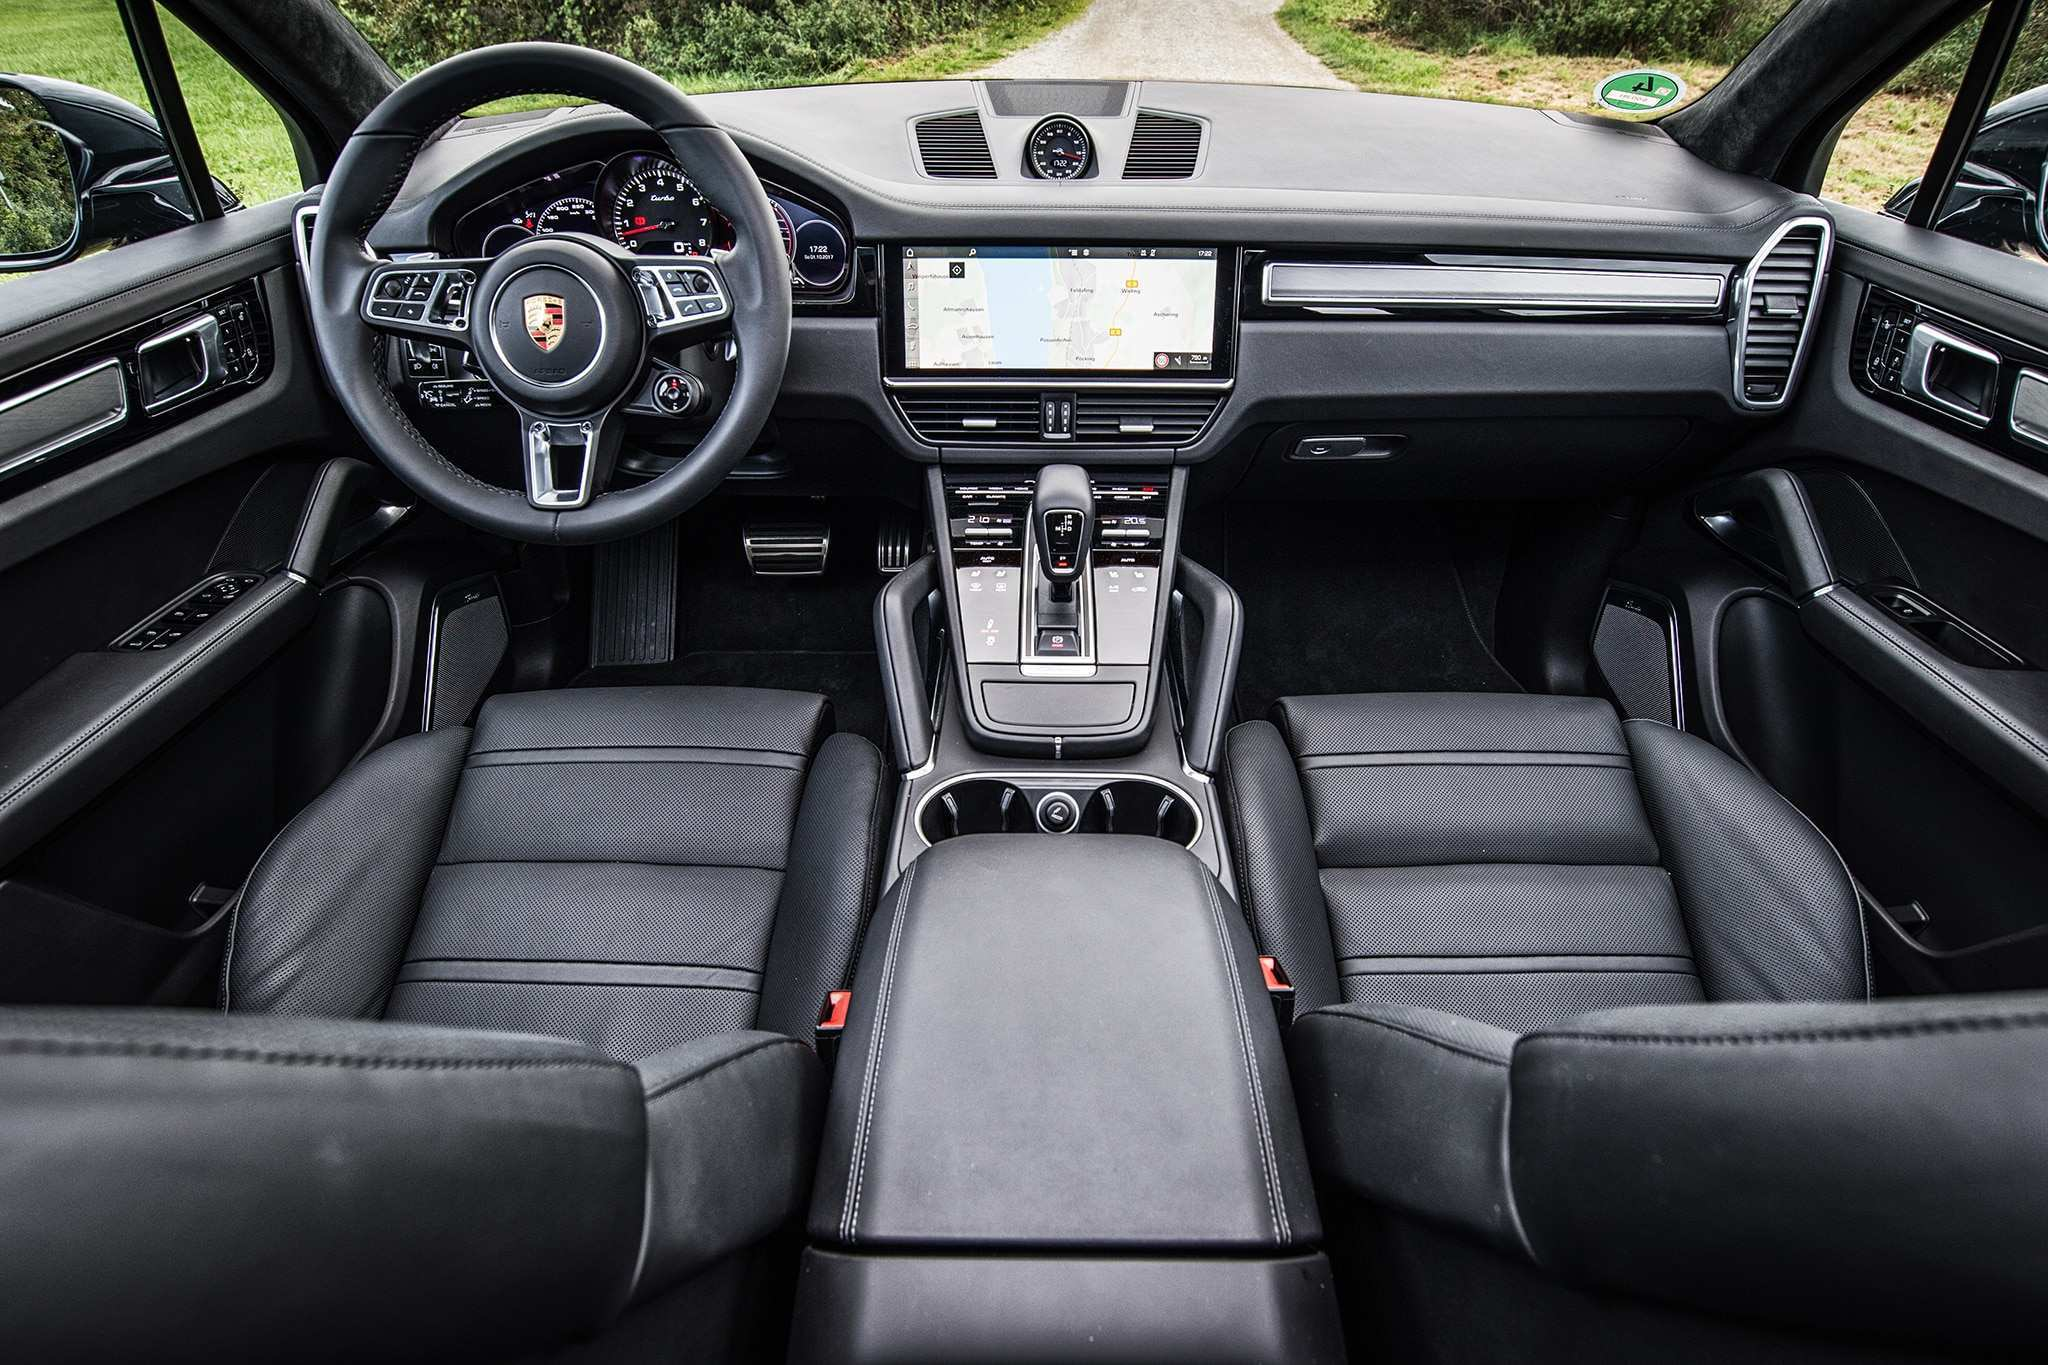 63 Gallery of 2019 Porsche Truck Research New with 2019 Porsche Truck